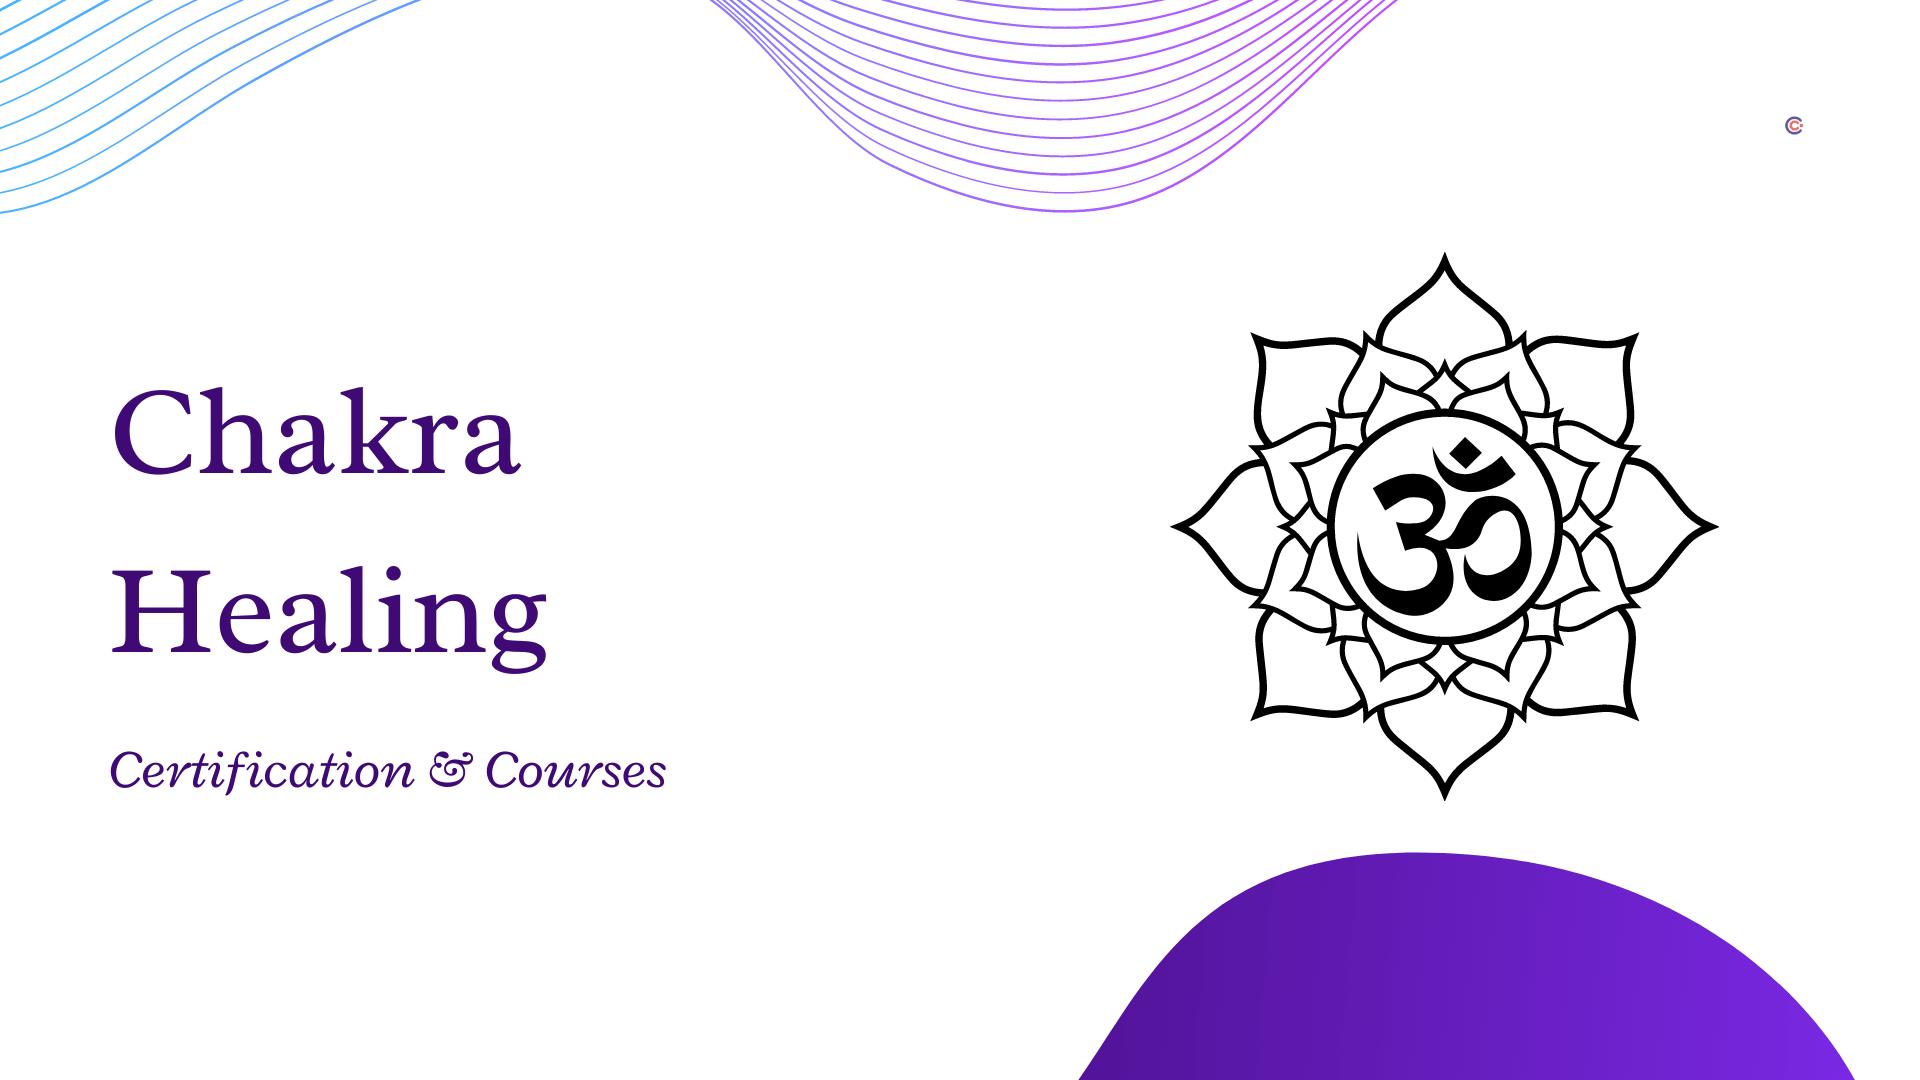 5 Best Chakra Healing Certification & Courses - Learn Chakra Healing Online